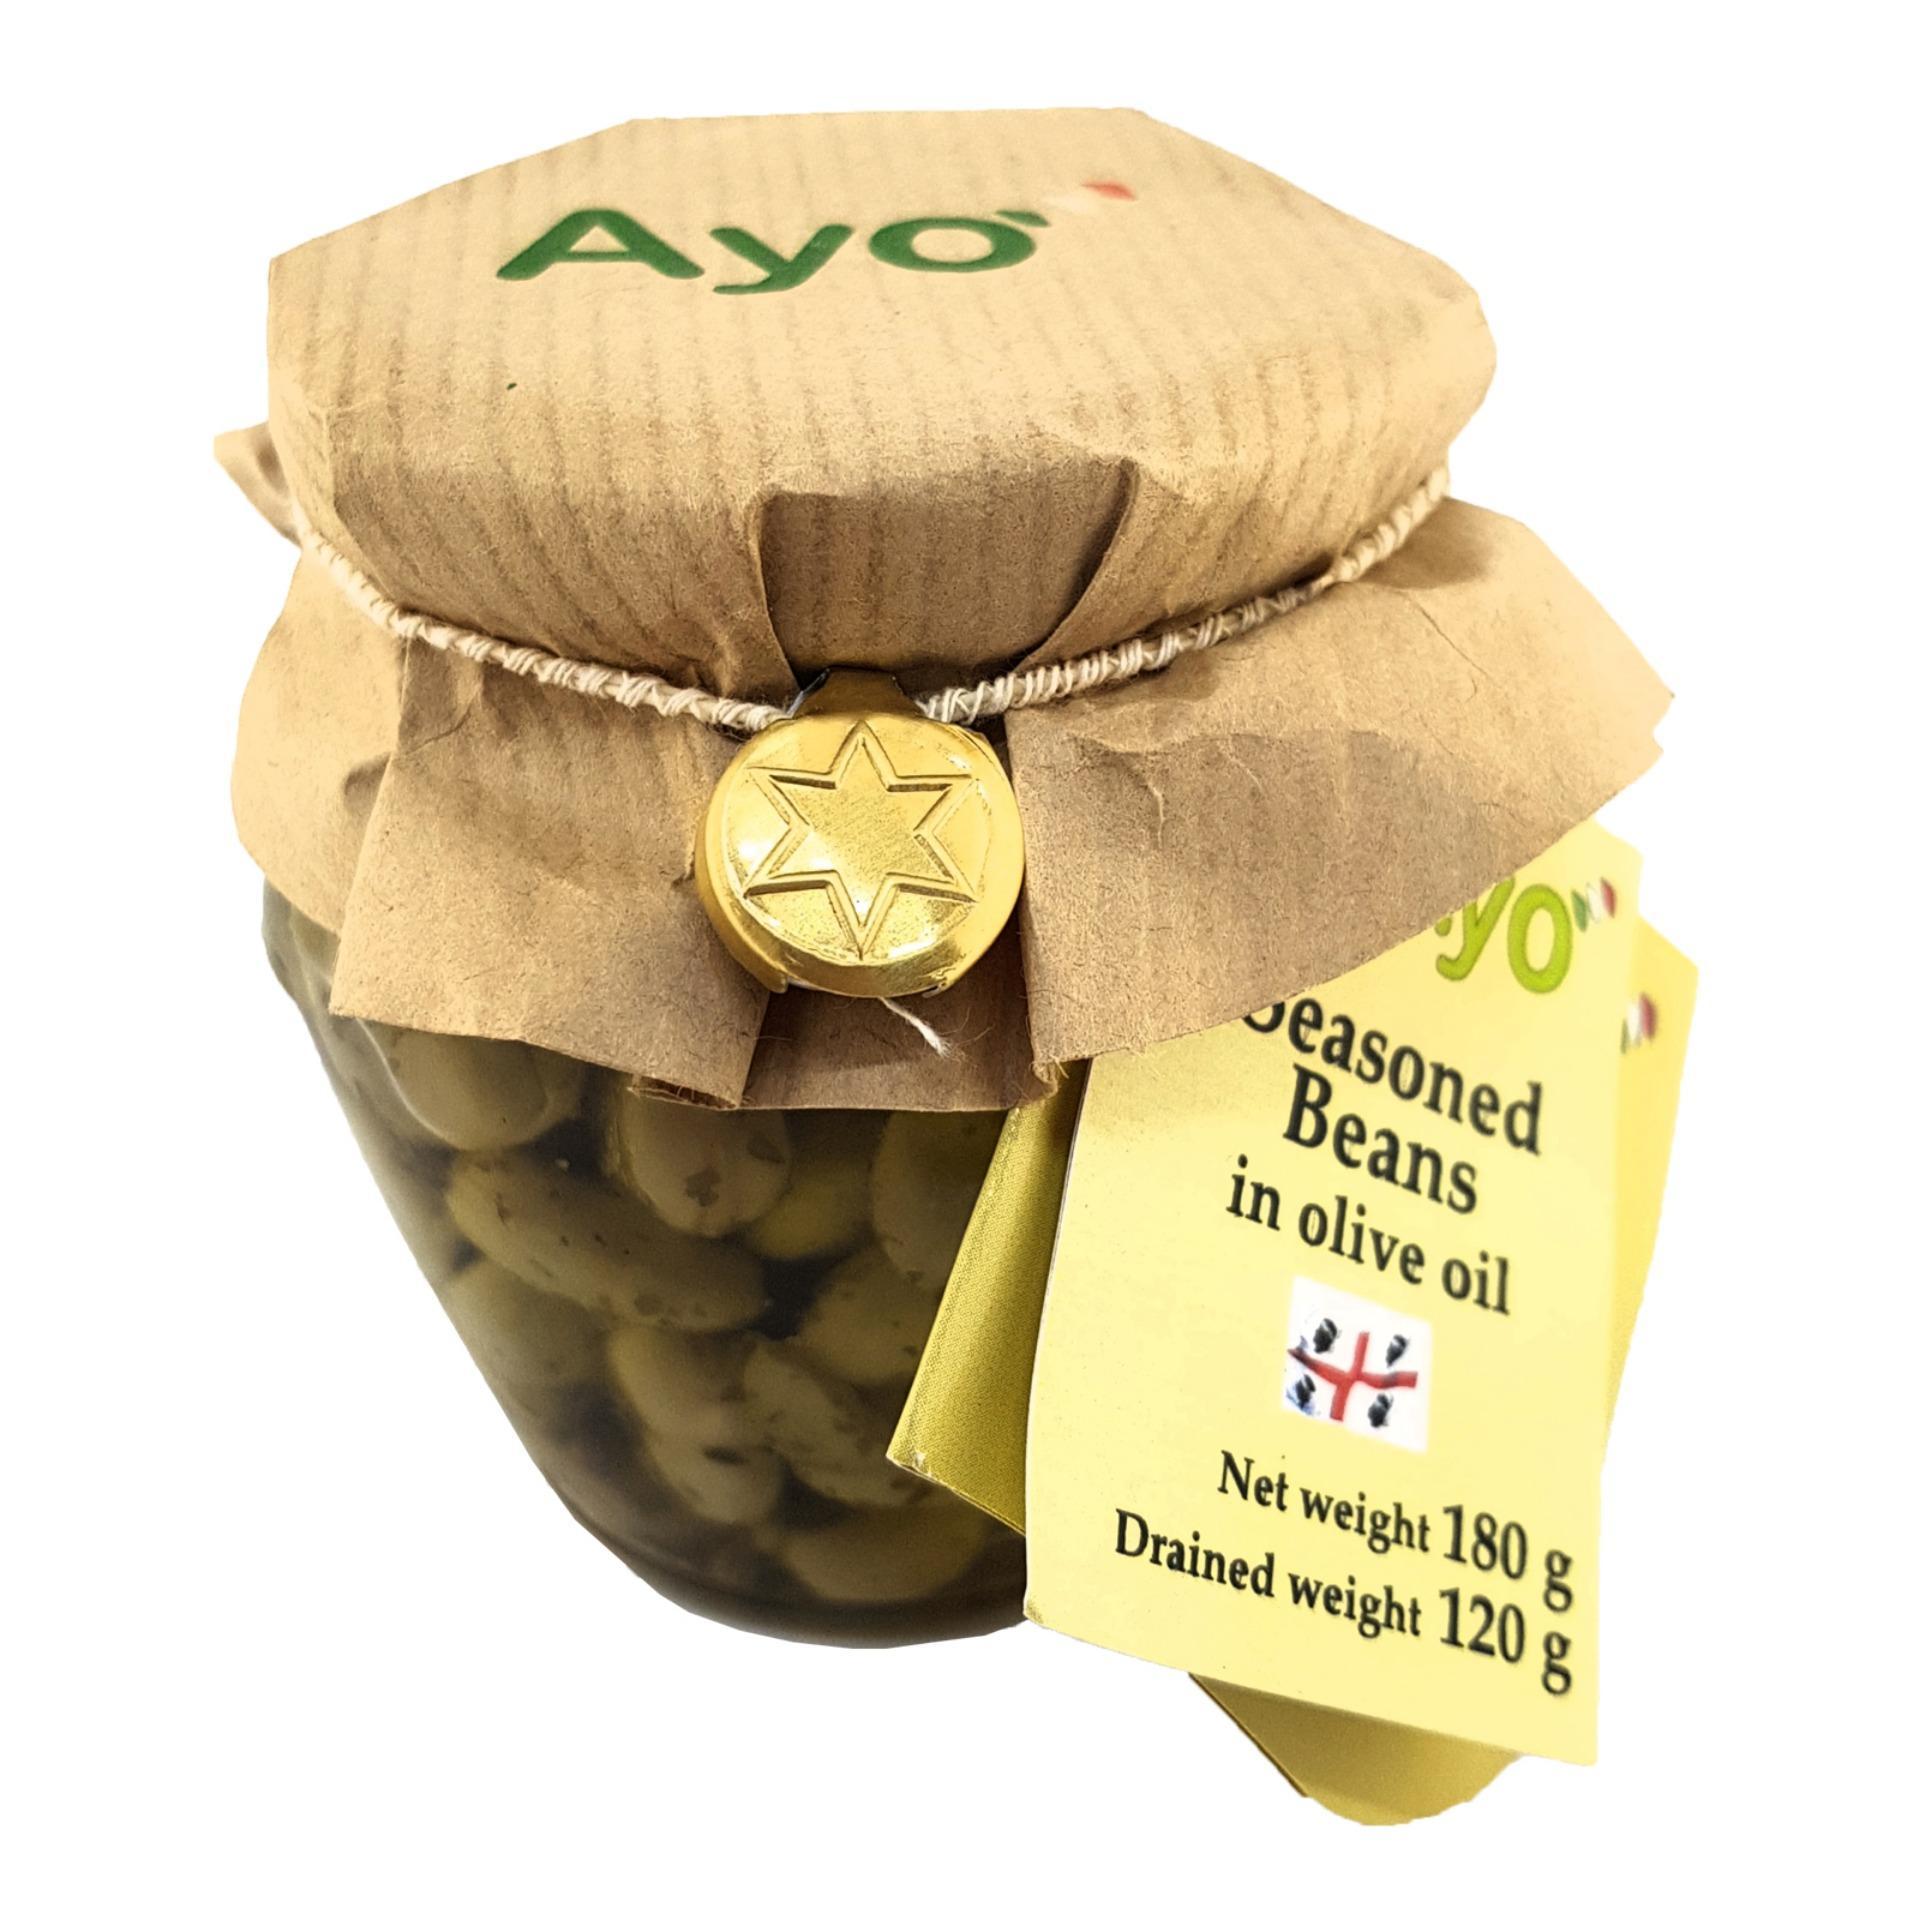 Ayo Seasoned Beans 180g By Horeca Marketplace.